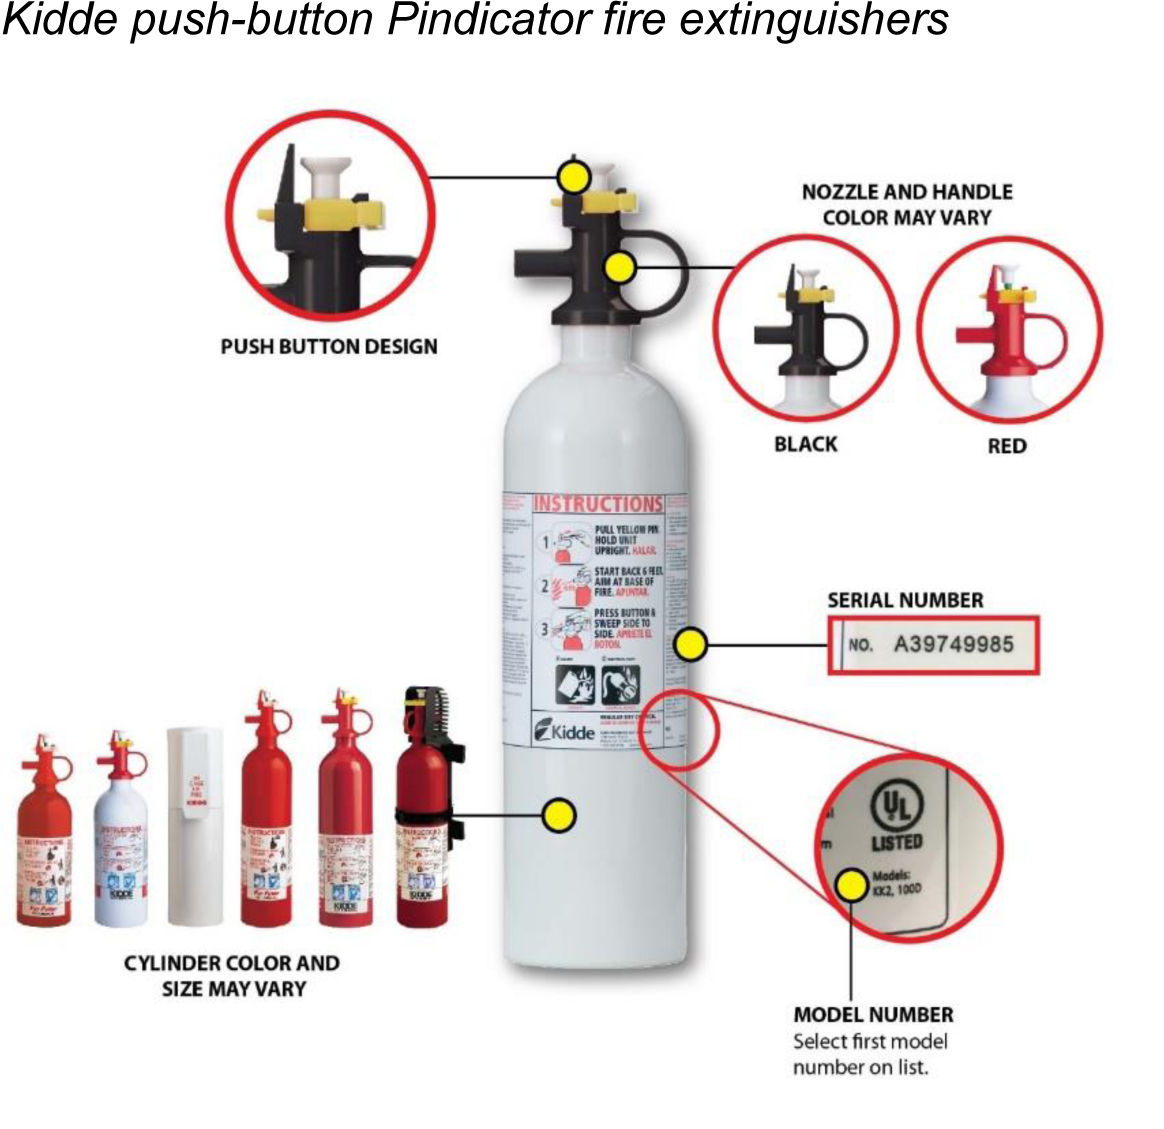 Kidde Recalls Fire Extinguishers That Dont Extinguish Fires